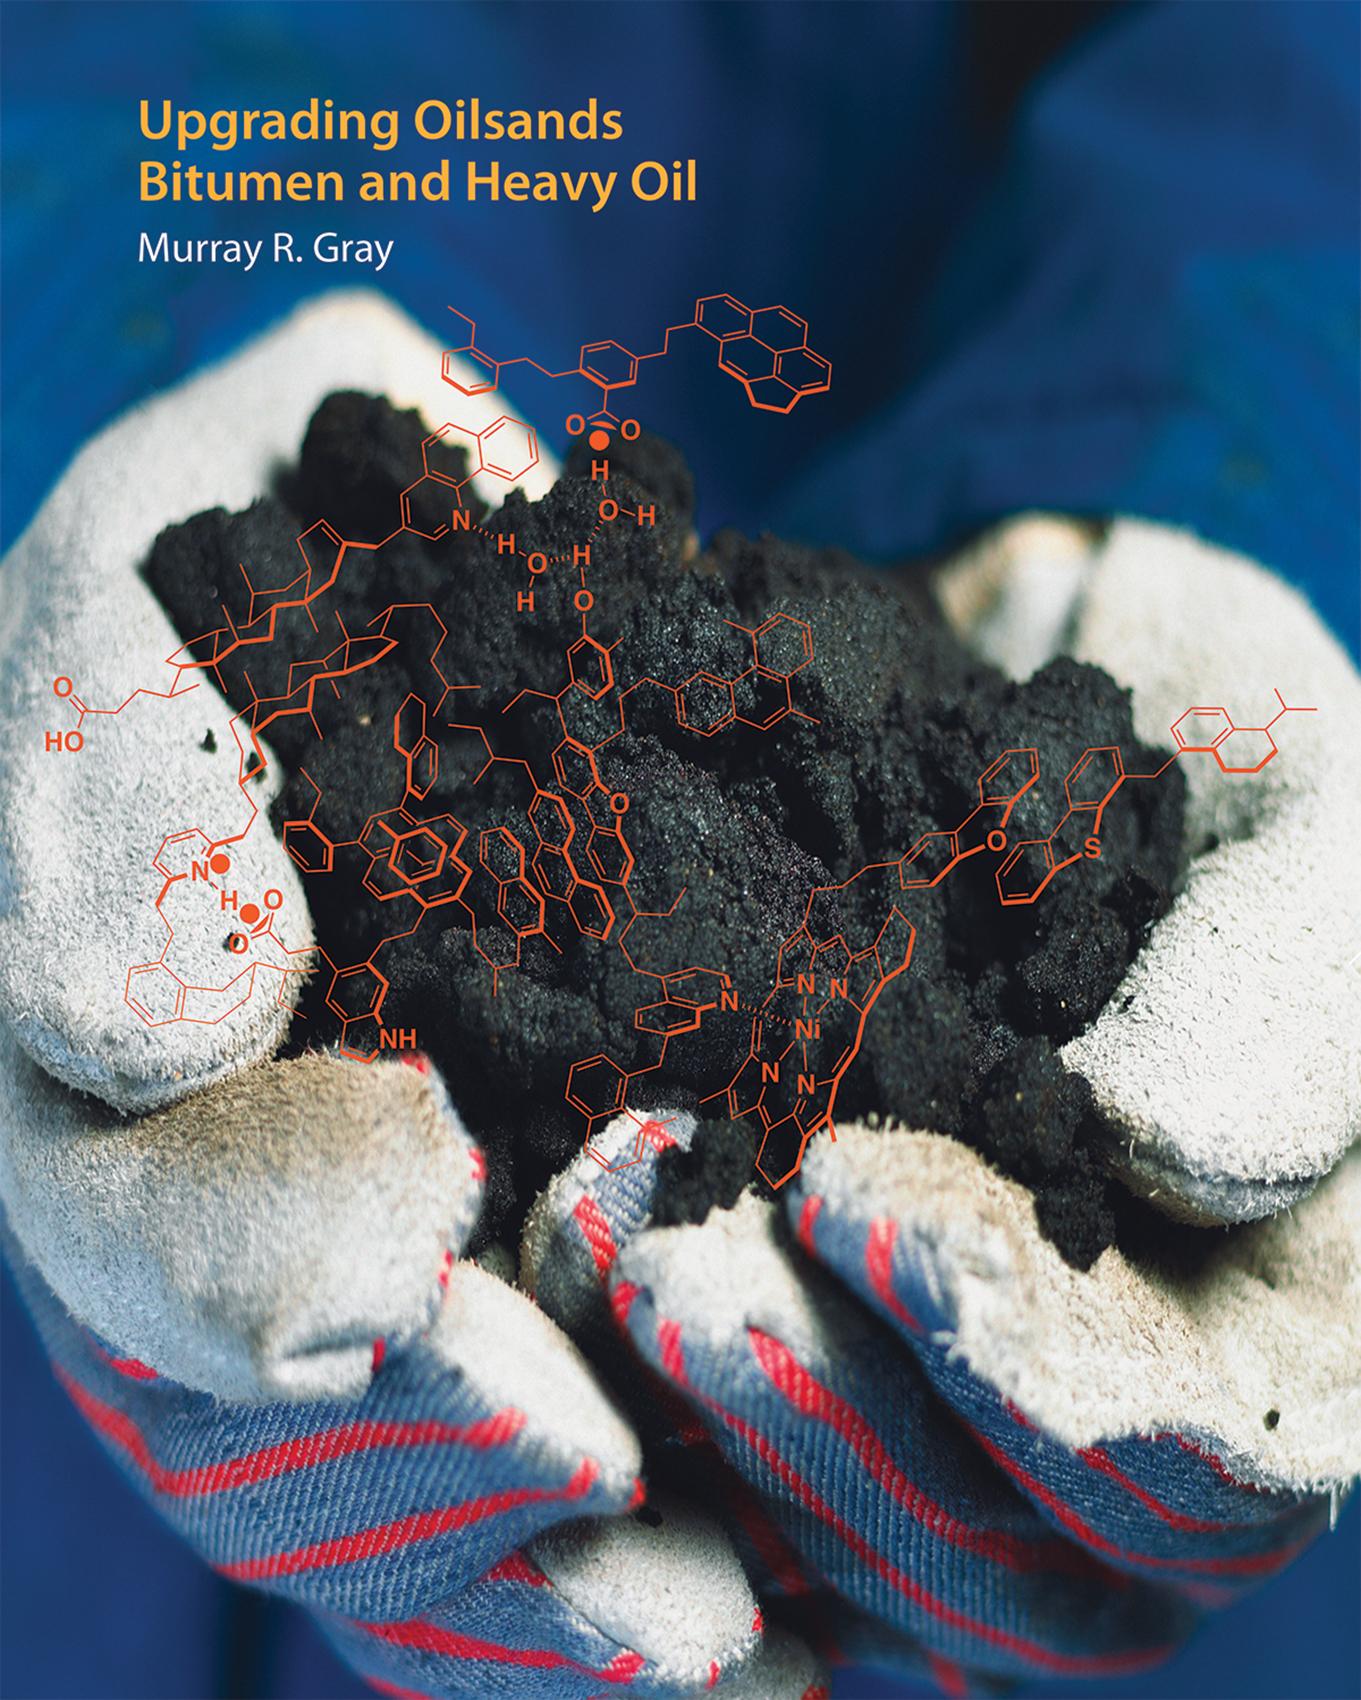 Upgrading Oilsands Bitumen and Heavy Oil